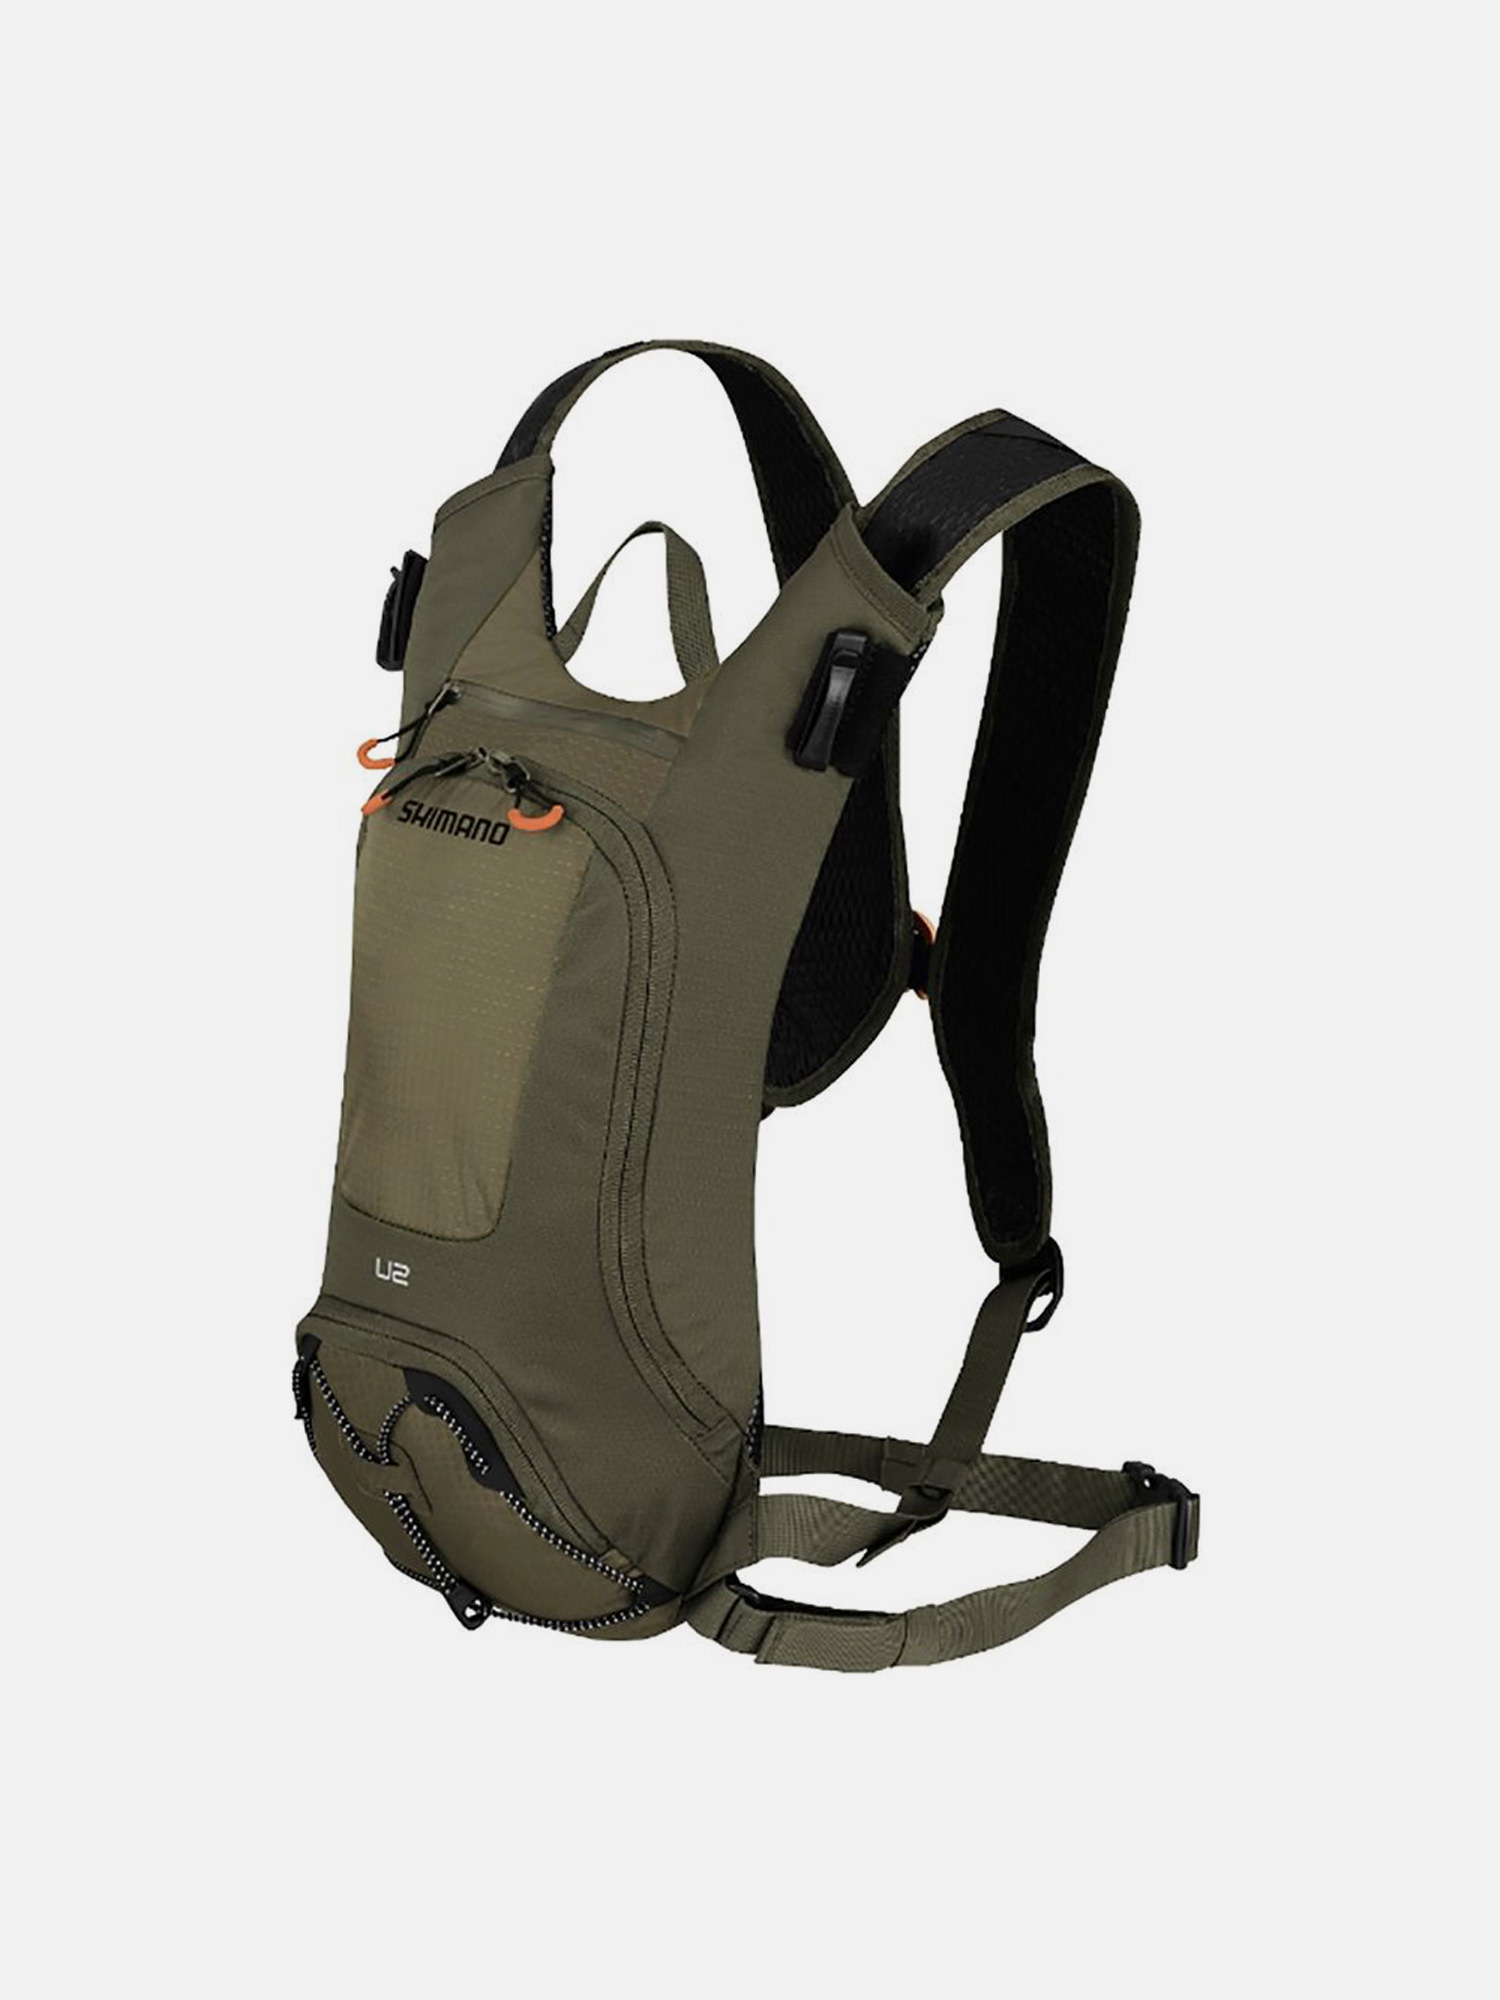 Shimano Unzen 2L Hydration Backpack - $79.99